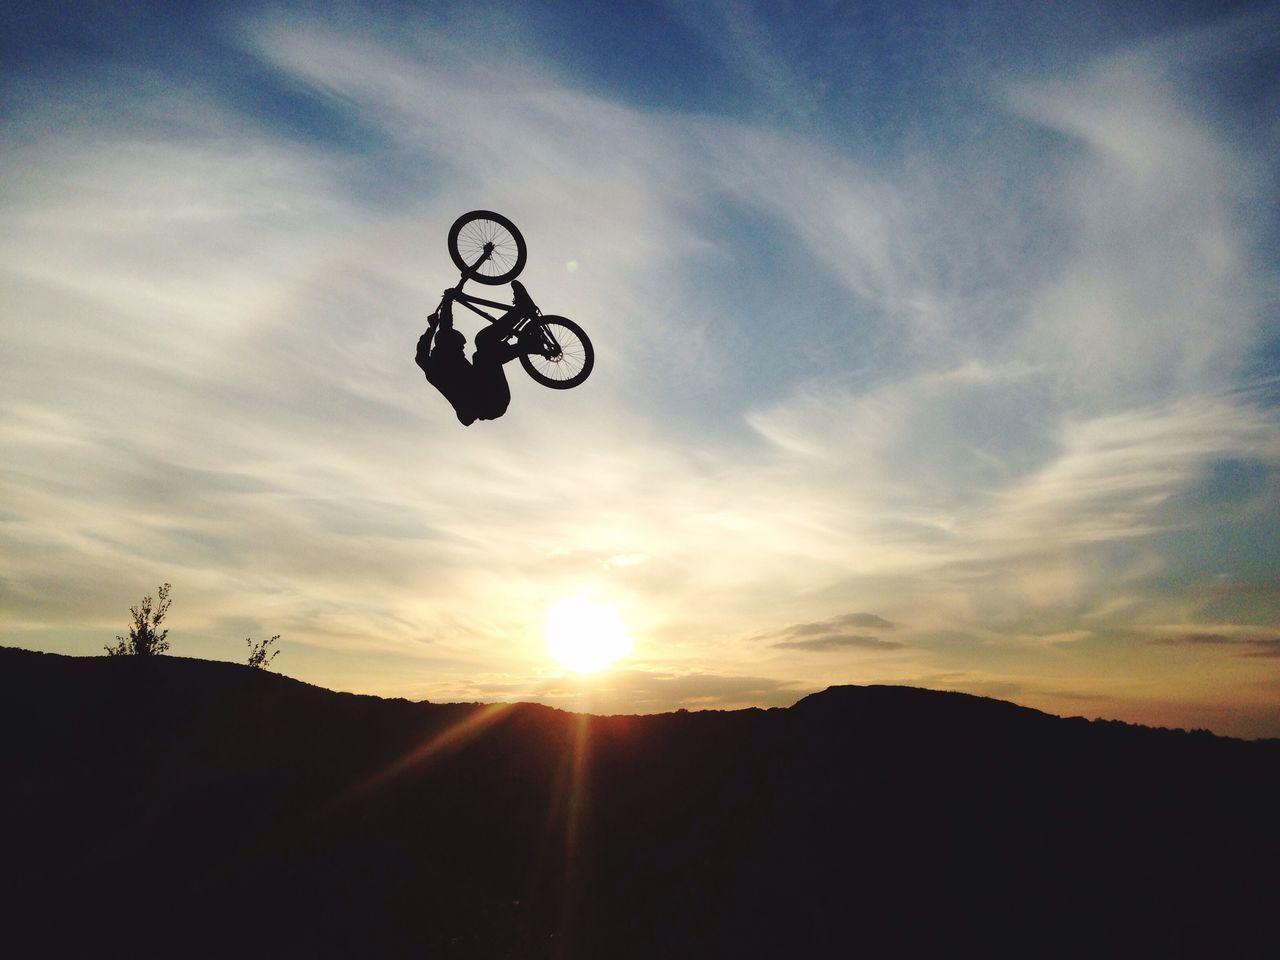 Sky Cloud - Sky Sunset Bicycle Low Angle View Nature Outdoors Sun MTB MTB Biking Tricks